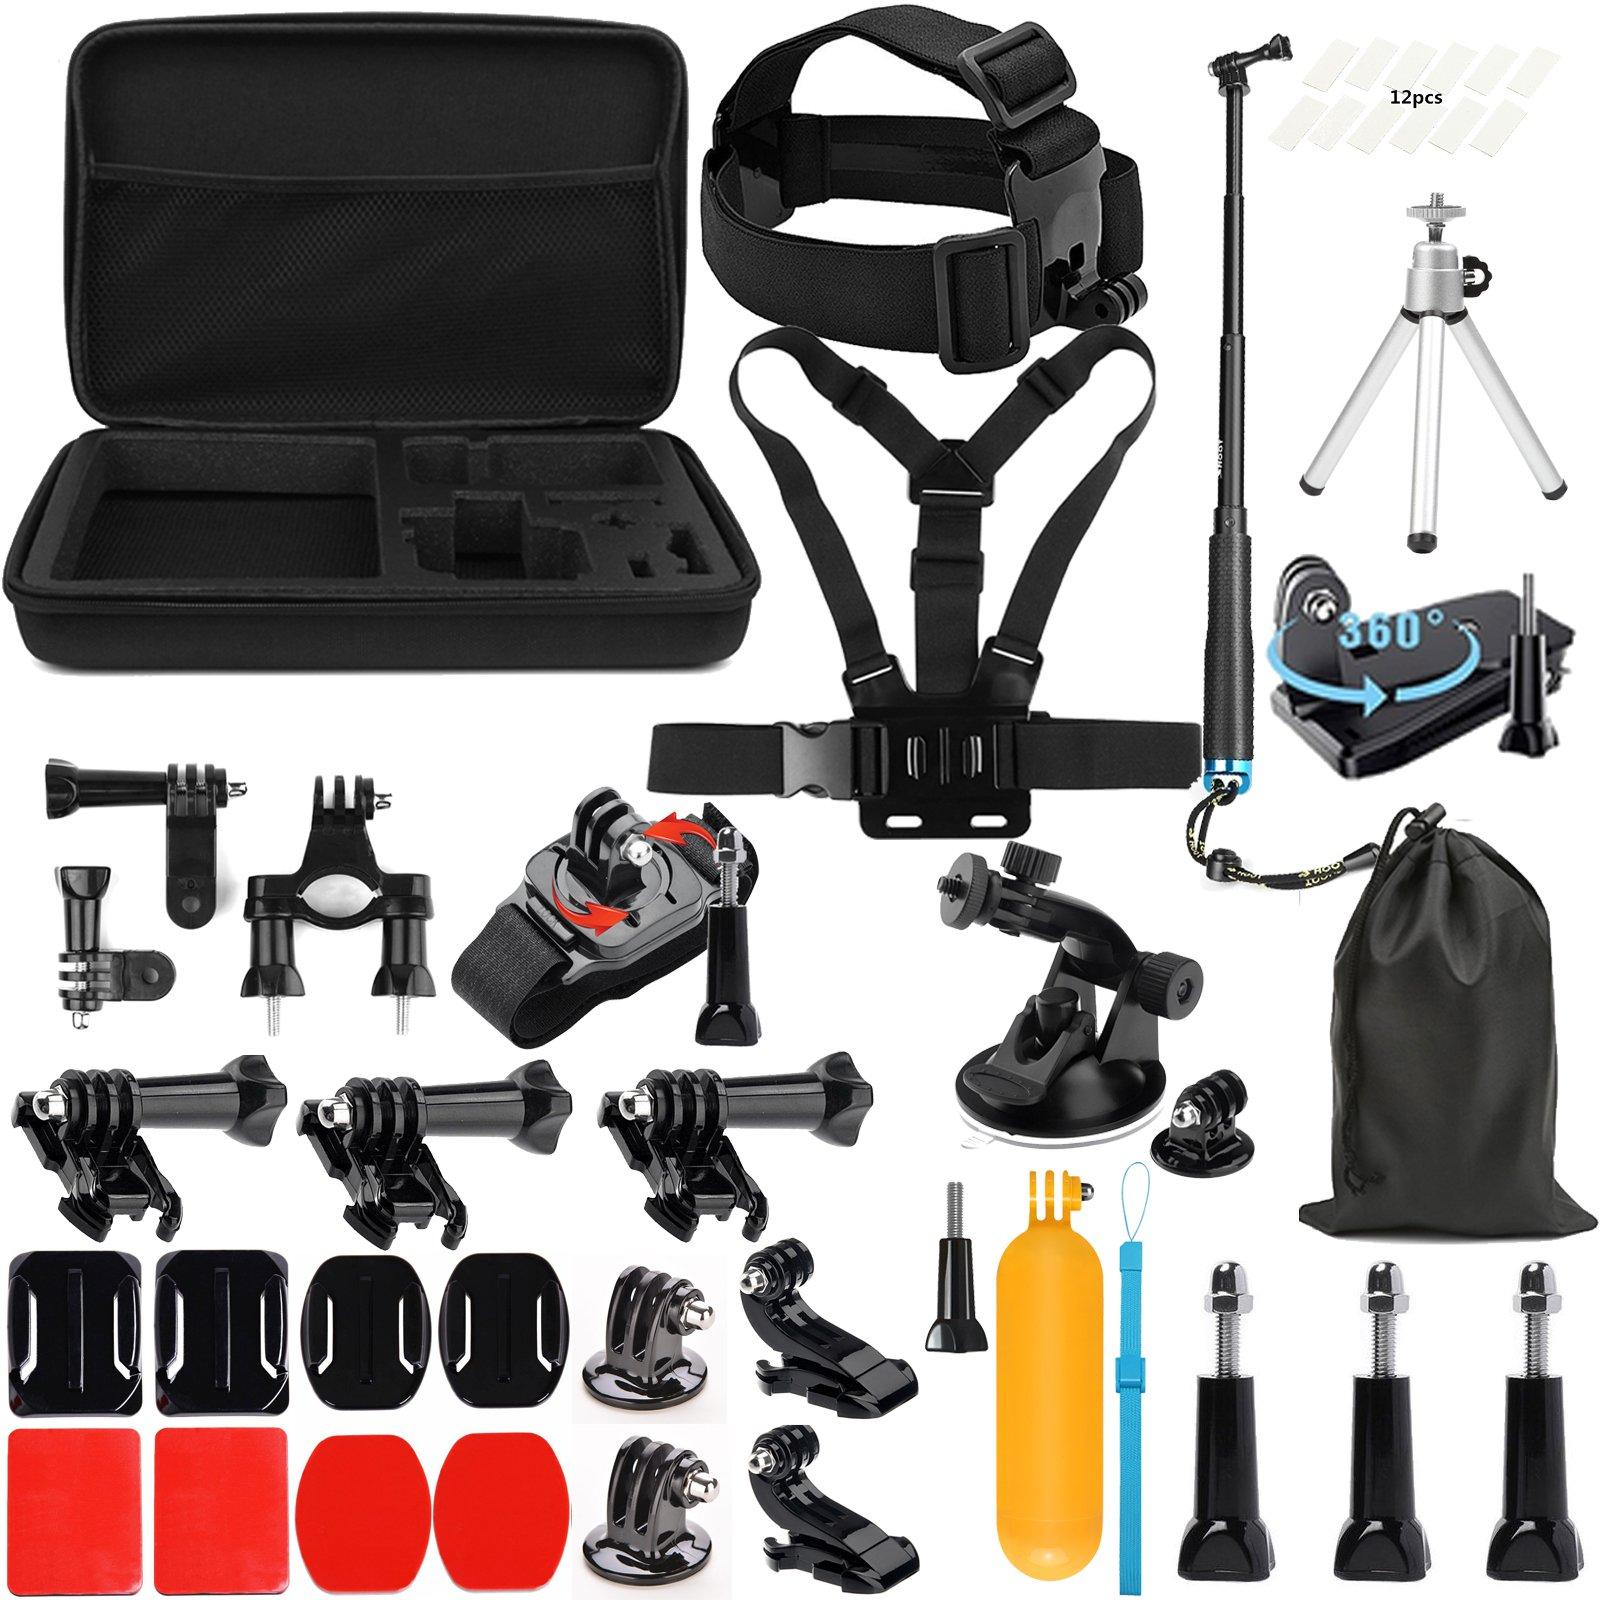 Lighten Outdoor Sports Accessories Kit for GoPro Hero 7 Black Silver White/6/Hero 5 4 3+ 3 2 1/Hero(2018)/Fusion AKASO EK7000 APEMAN Campark FITFORT 4K WiFi Action Camera by Lighten